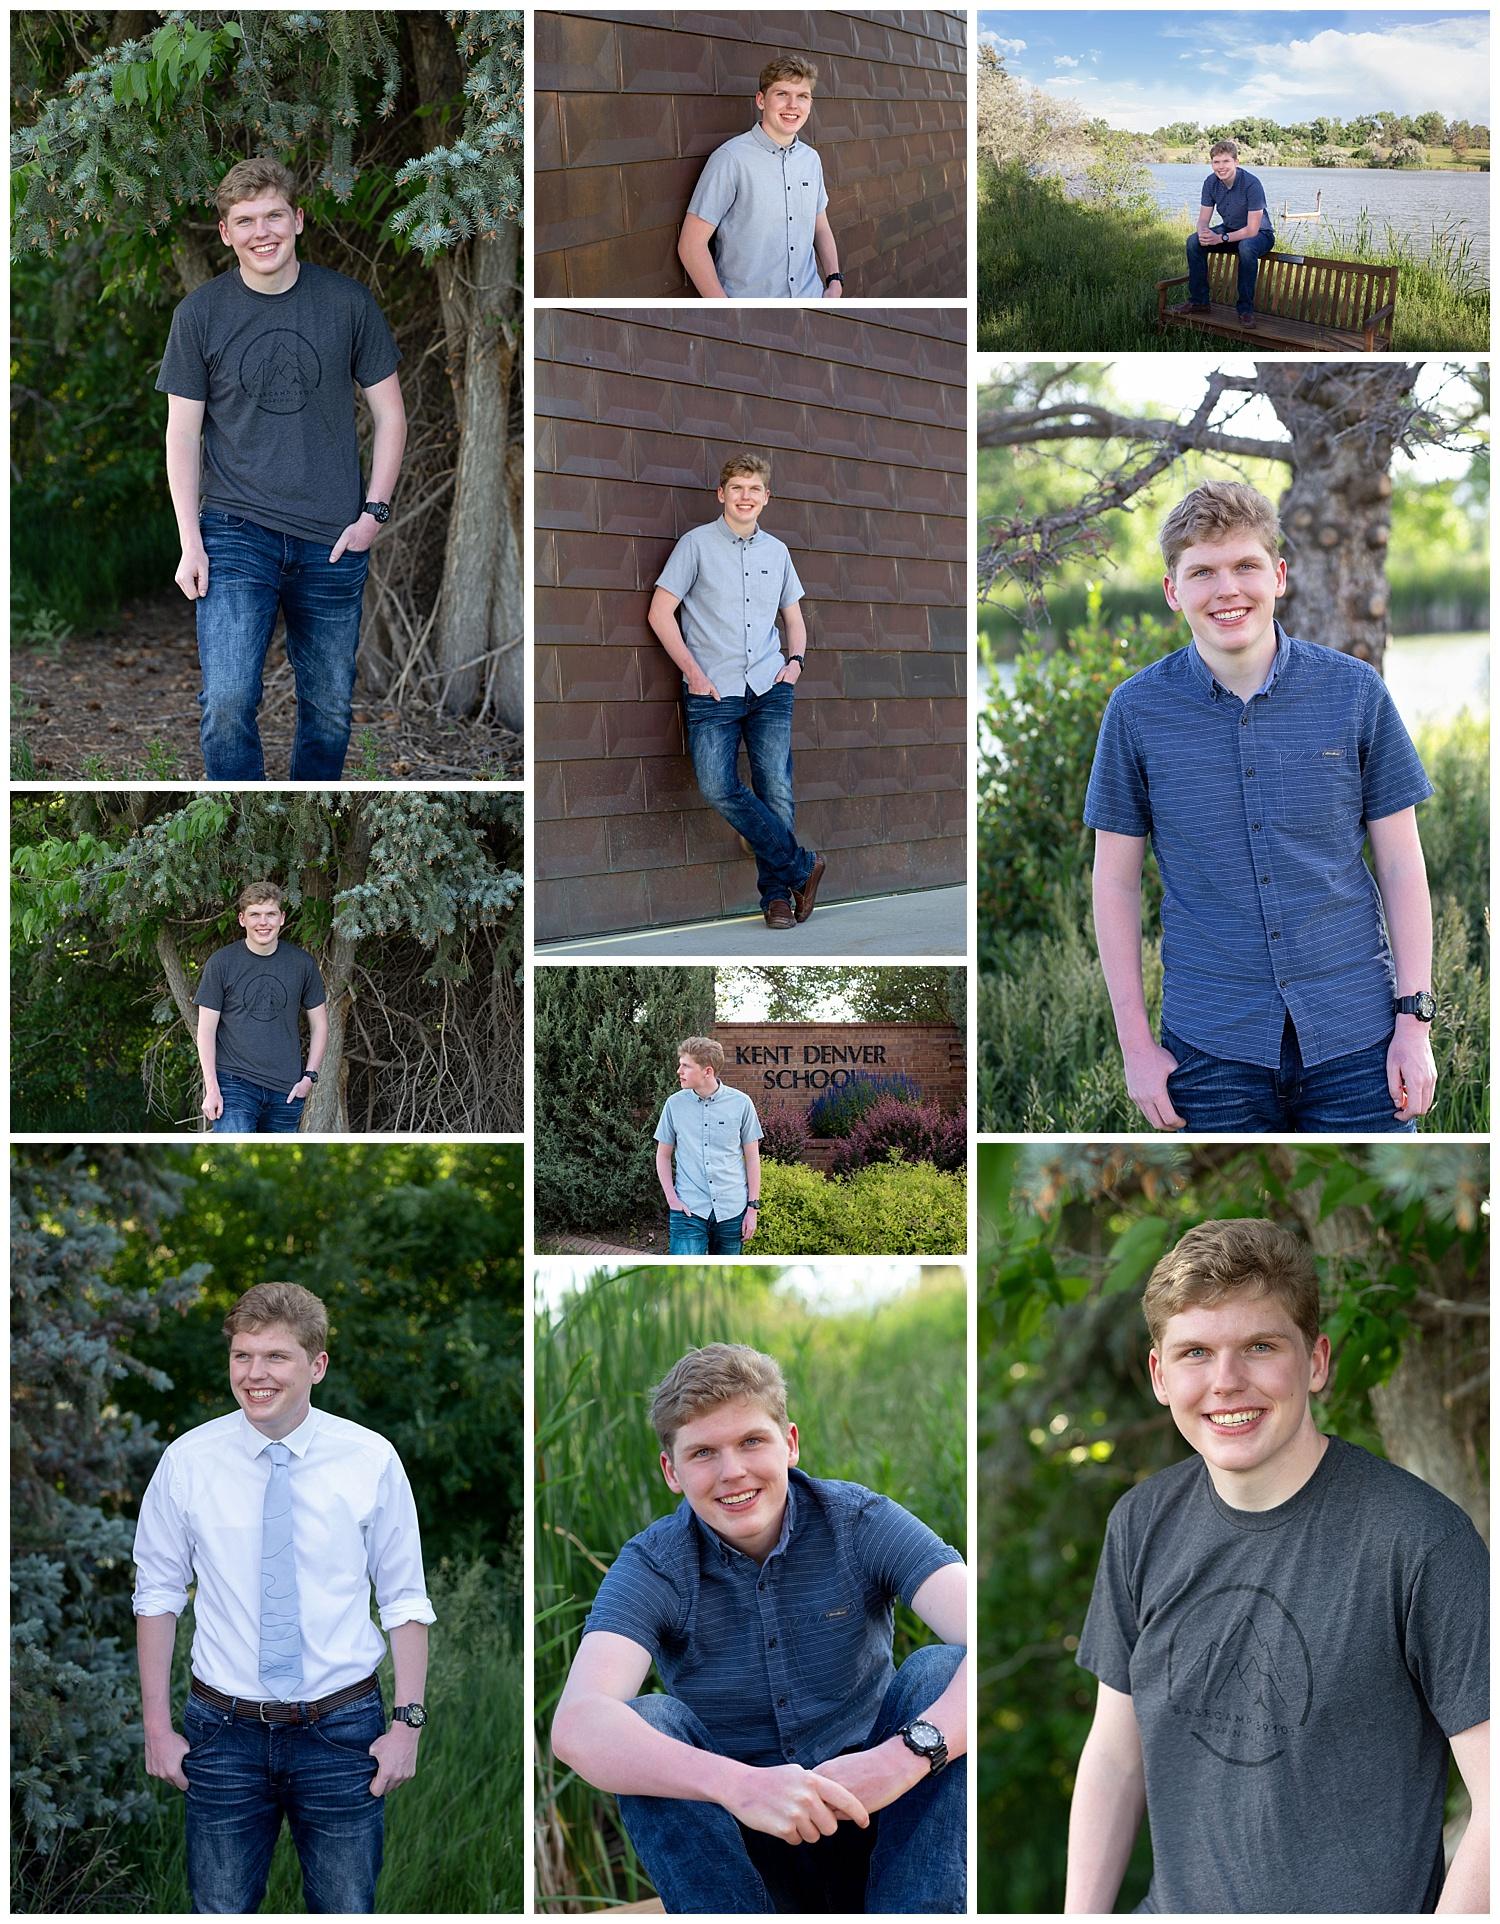 Grant had his high school senior portraits taken on June 25, 2019.